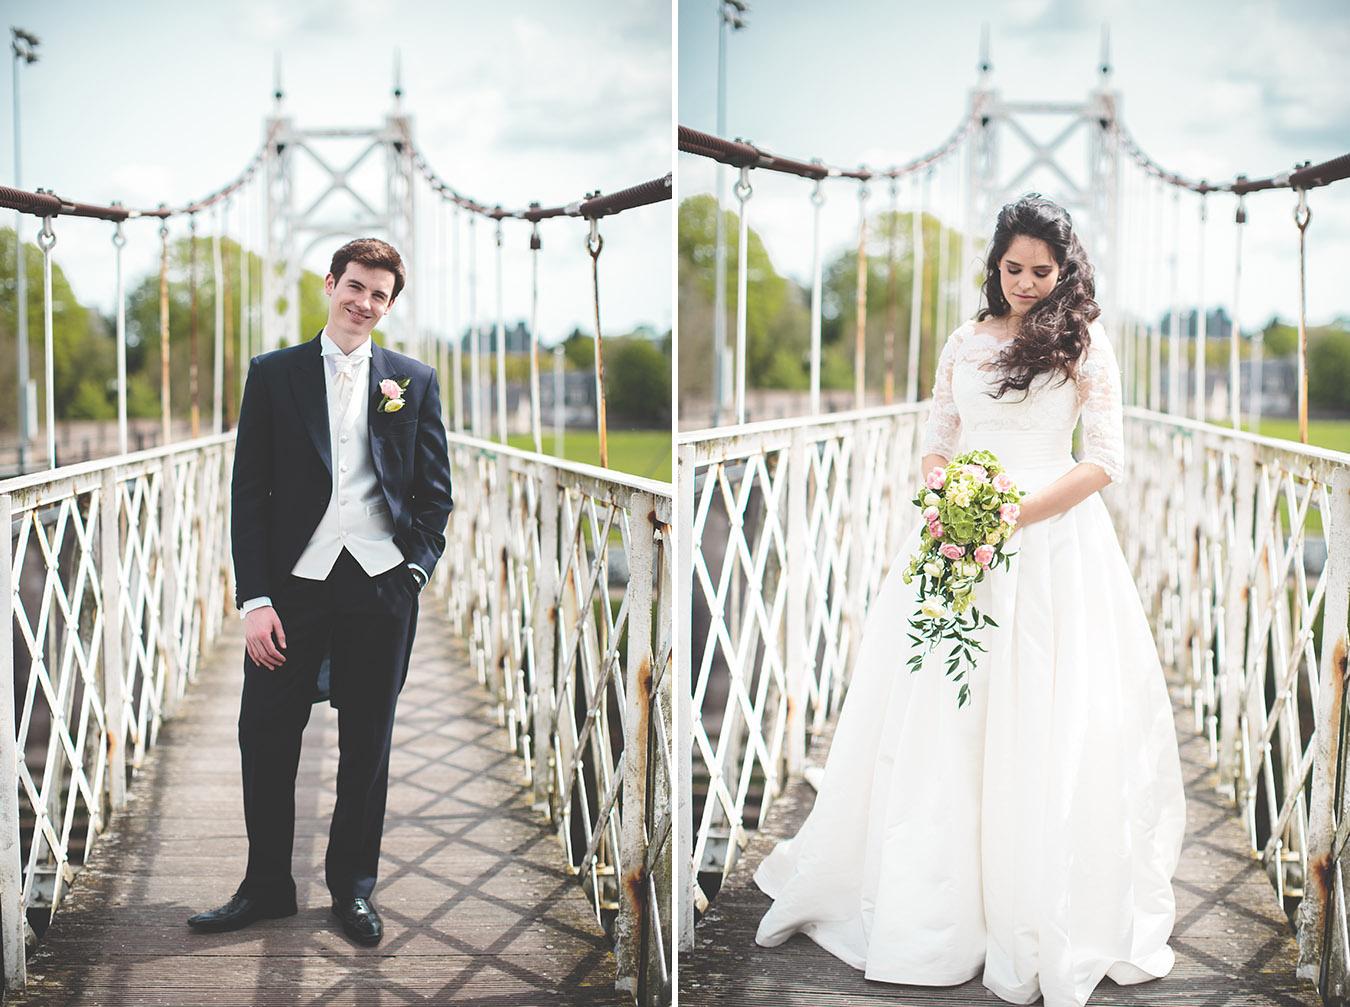 fitzgerald park cork wedding